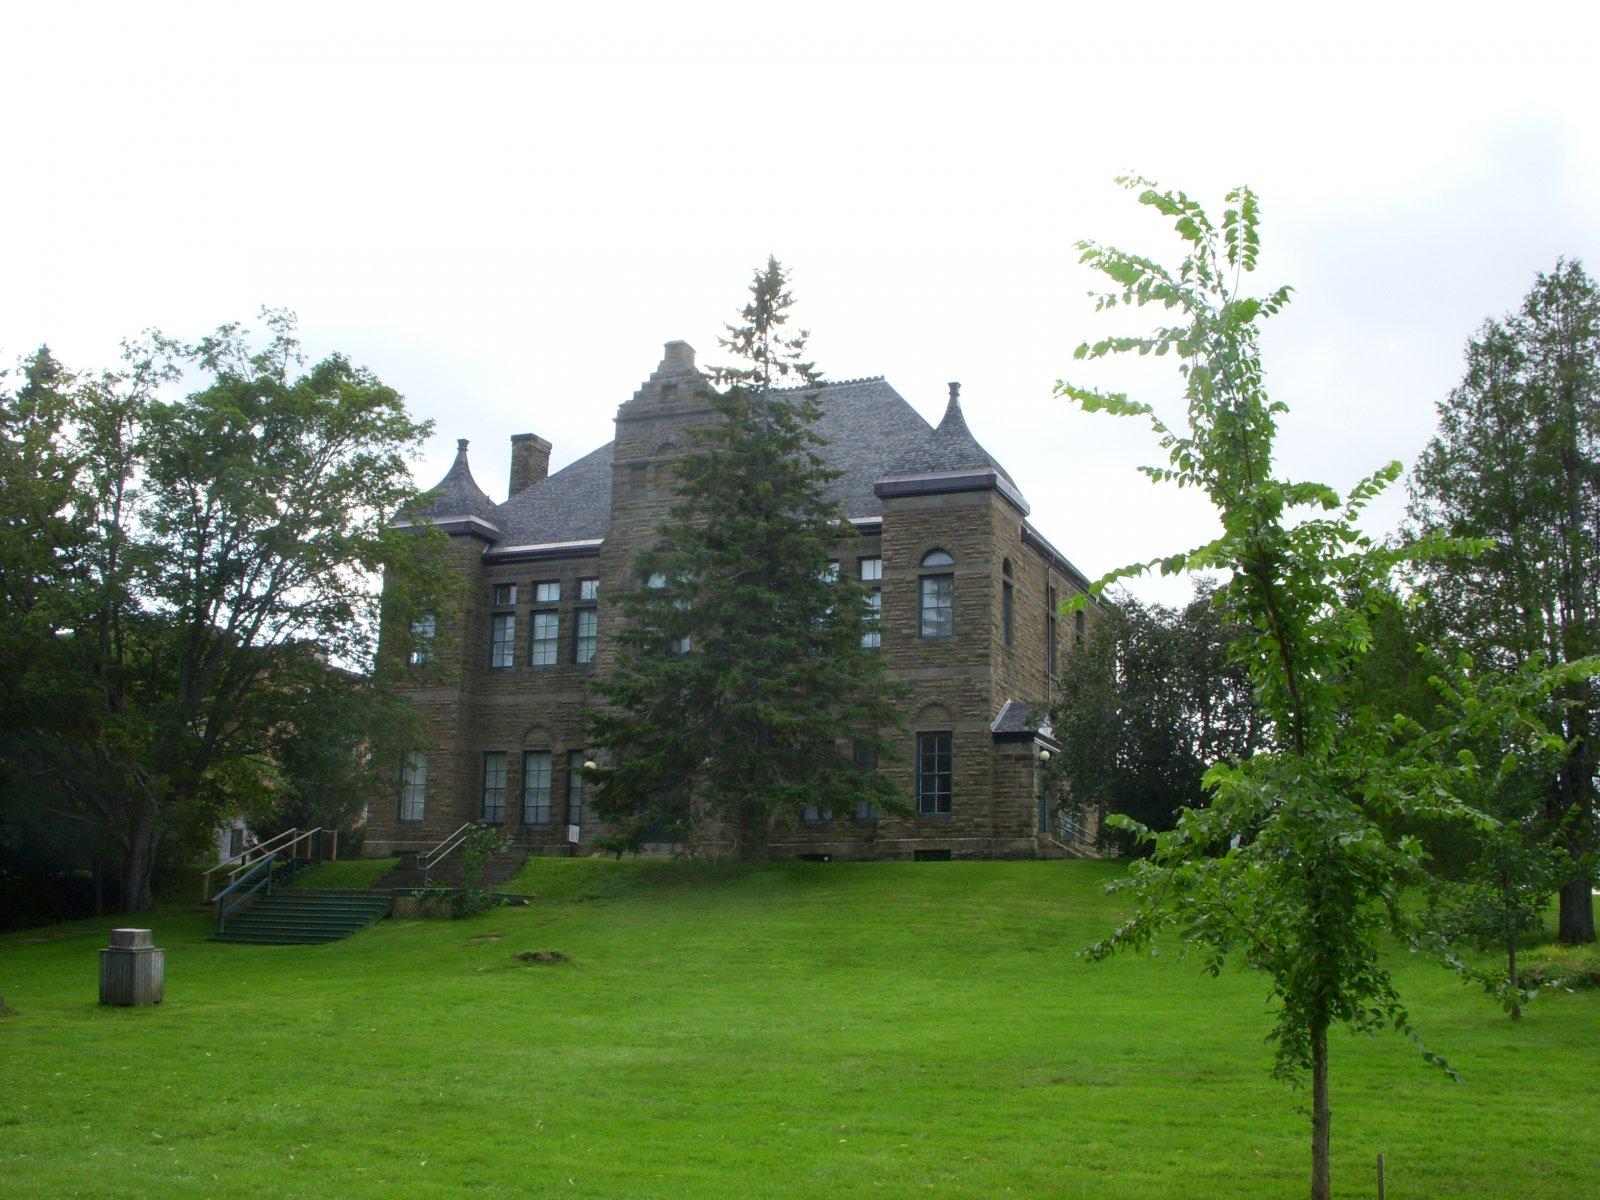 Click image for larger version  Name:Nova Scotia Aug2011 017.jpg Views:66 Size:324.7 KB ID:138739